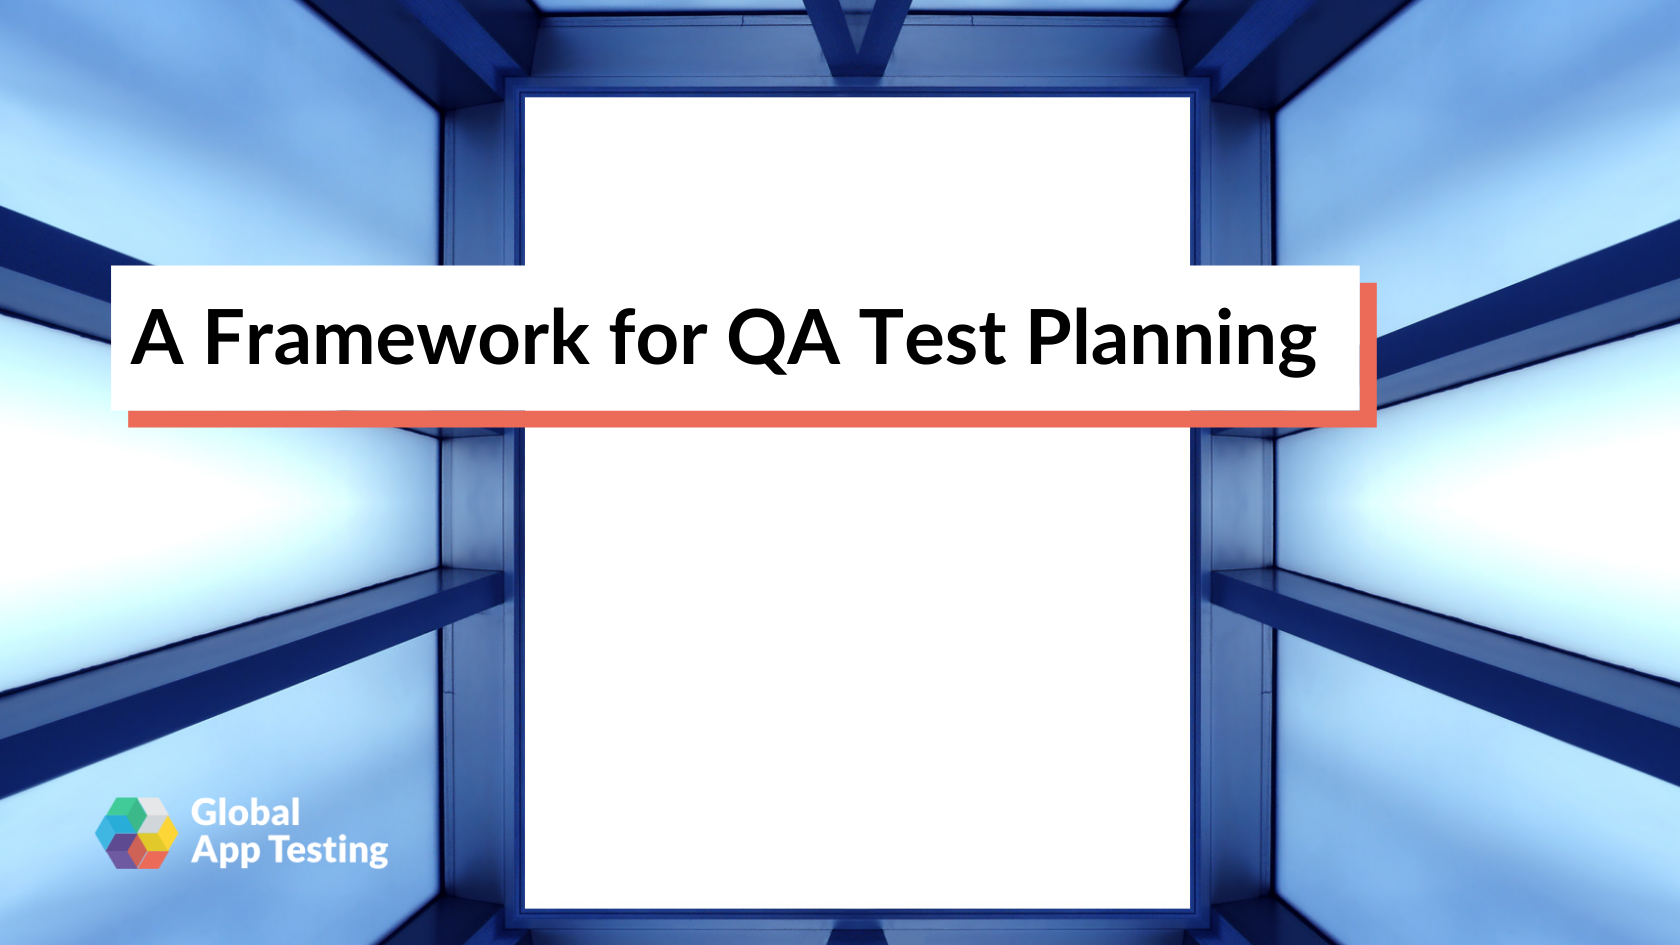 A Framework for QA Test Planning